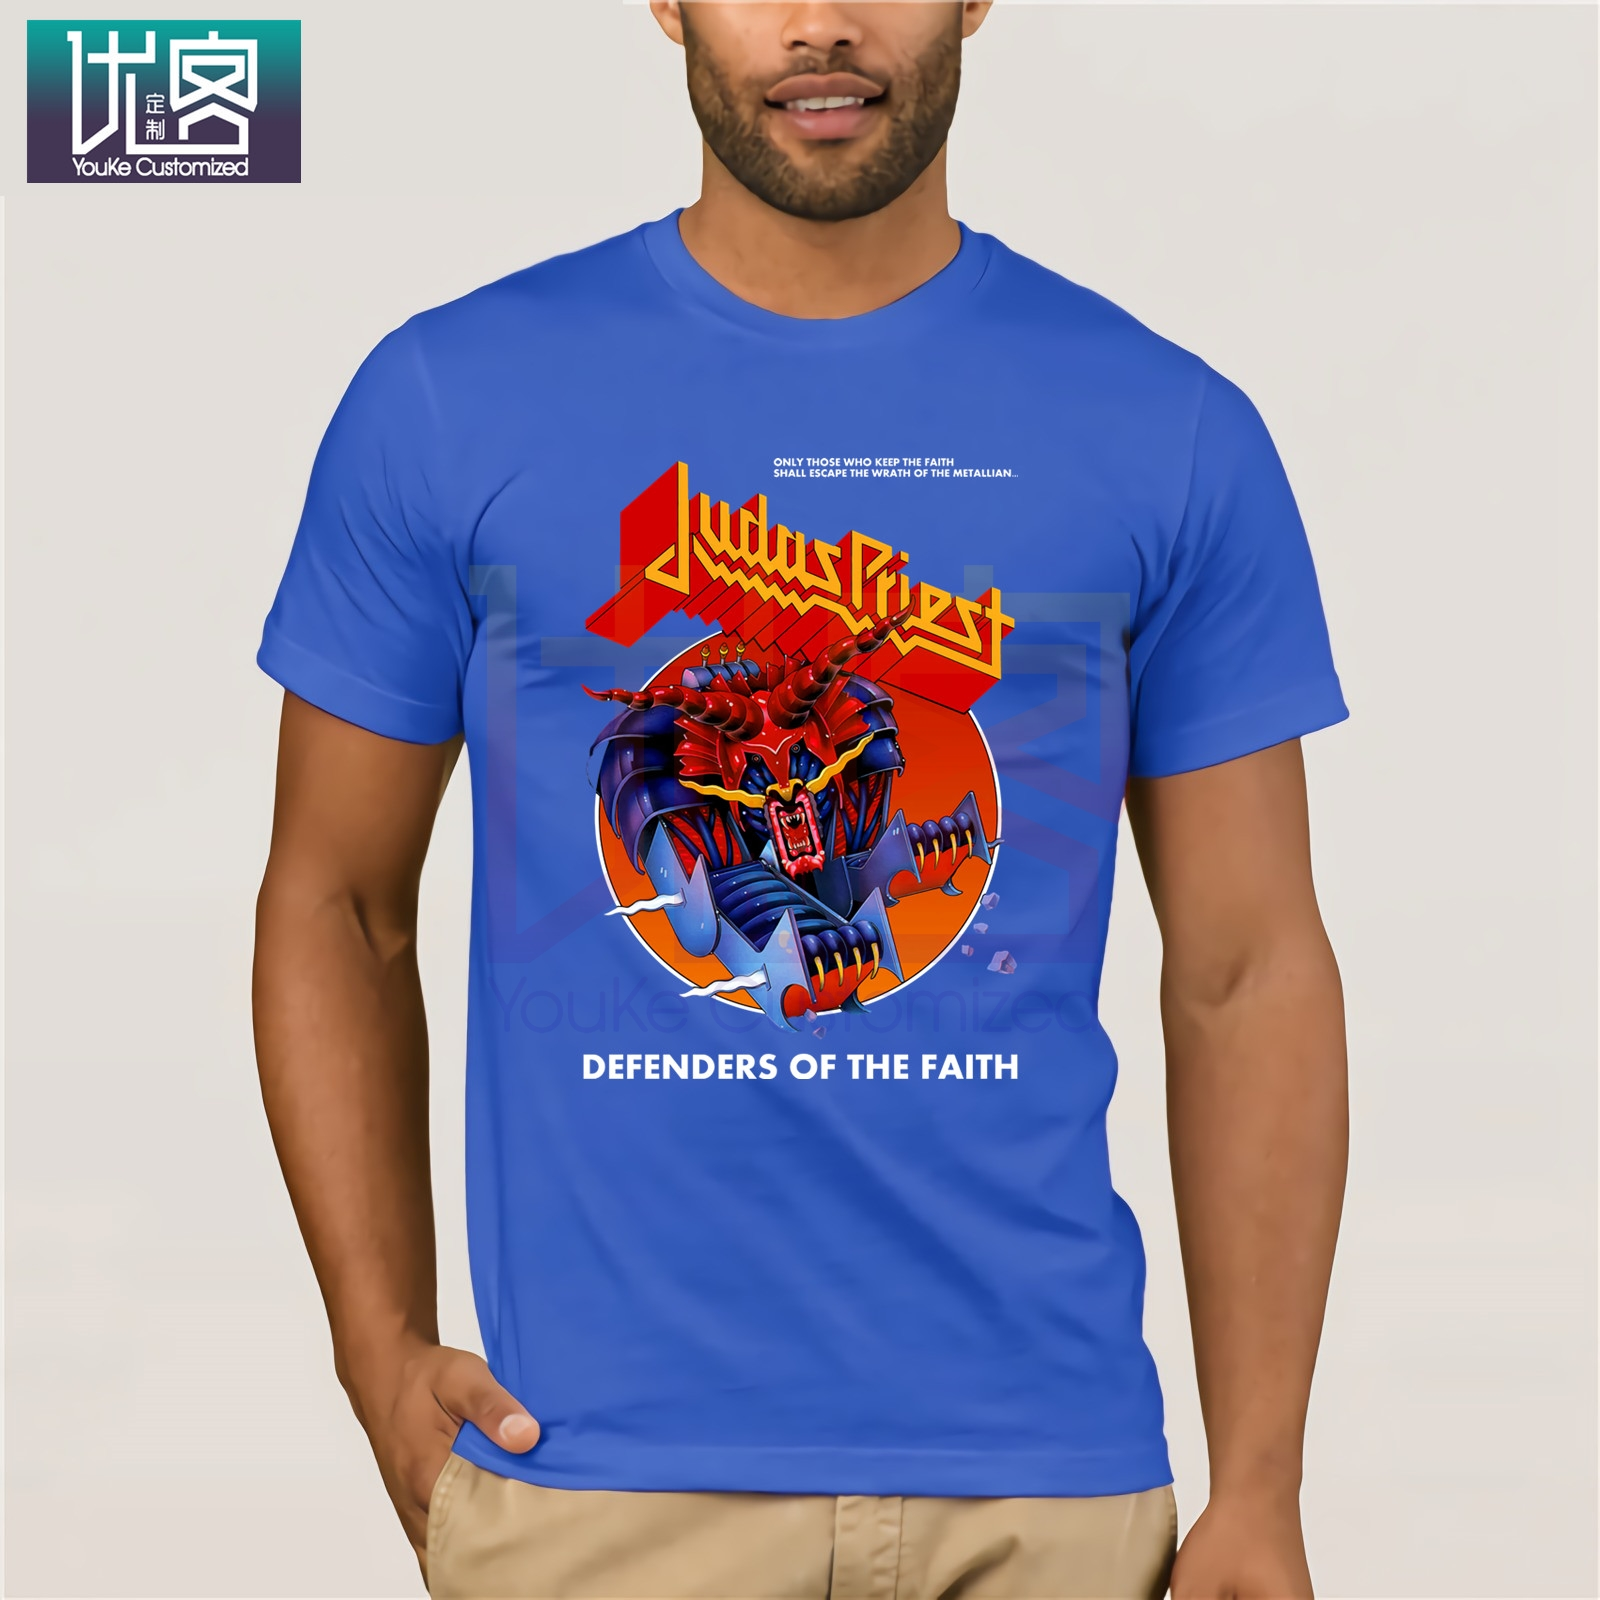 Official Judas Priest Painkiller Unisex T-Shirt Defenders Of the Faith British S